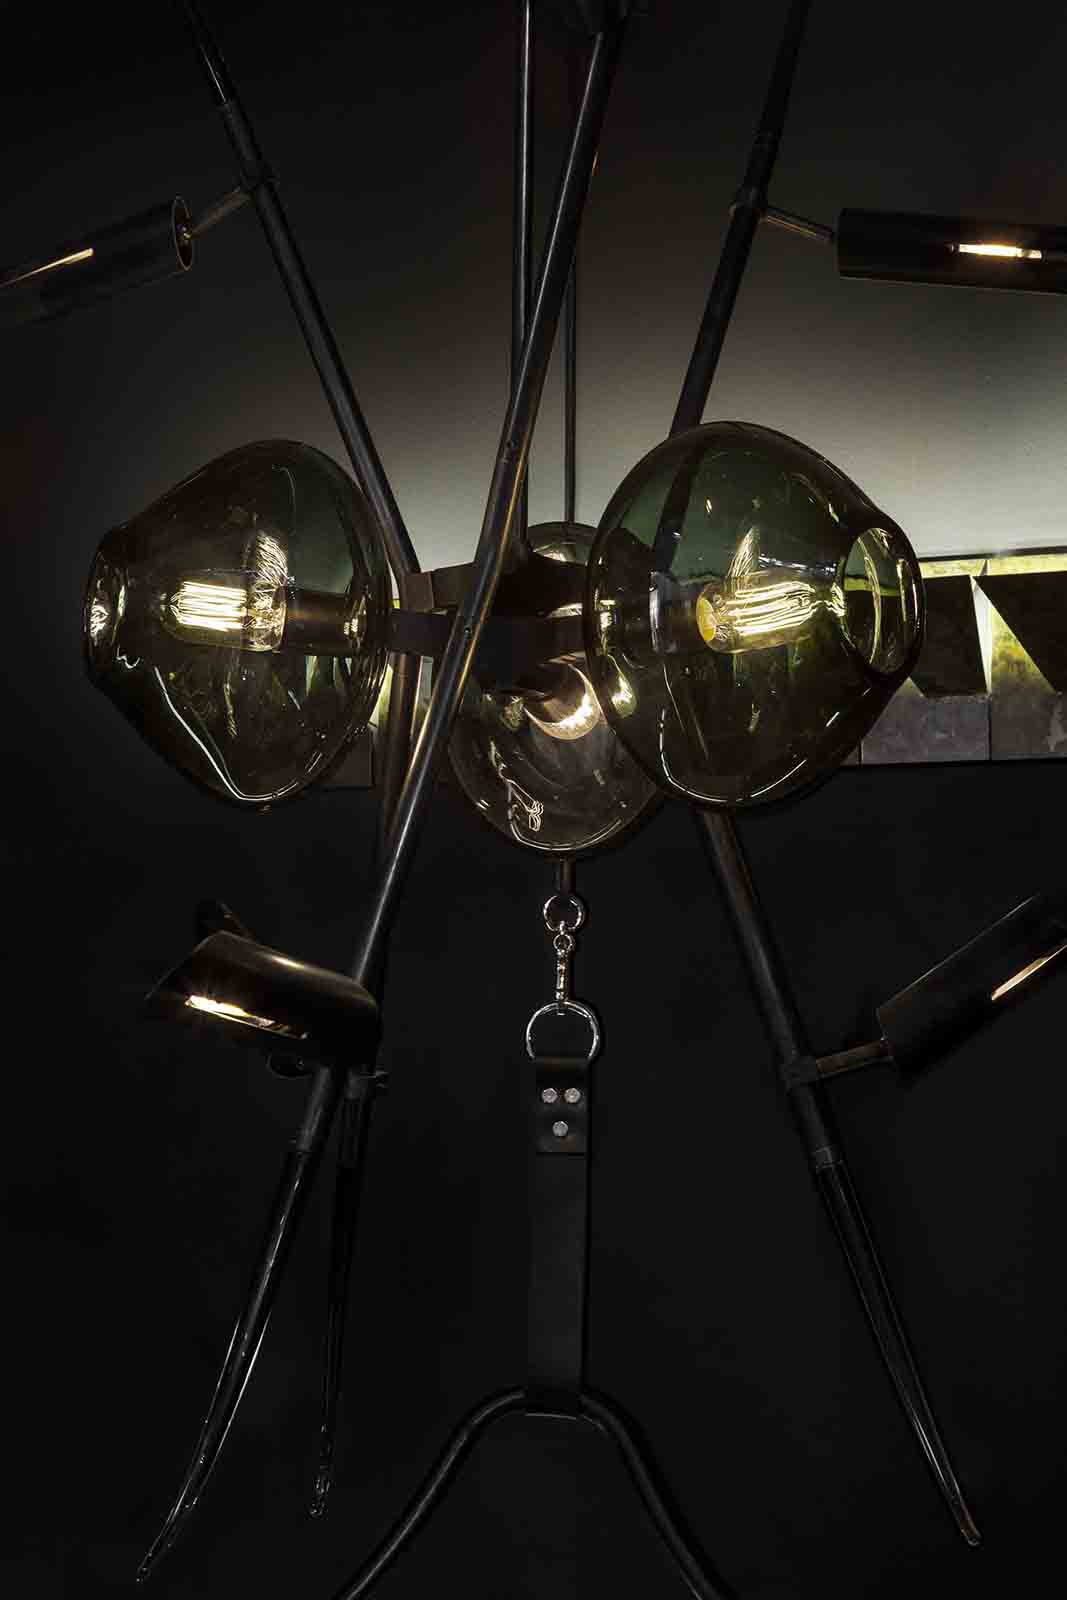 The stunning swing seat/light fitting installation by Lumifer